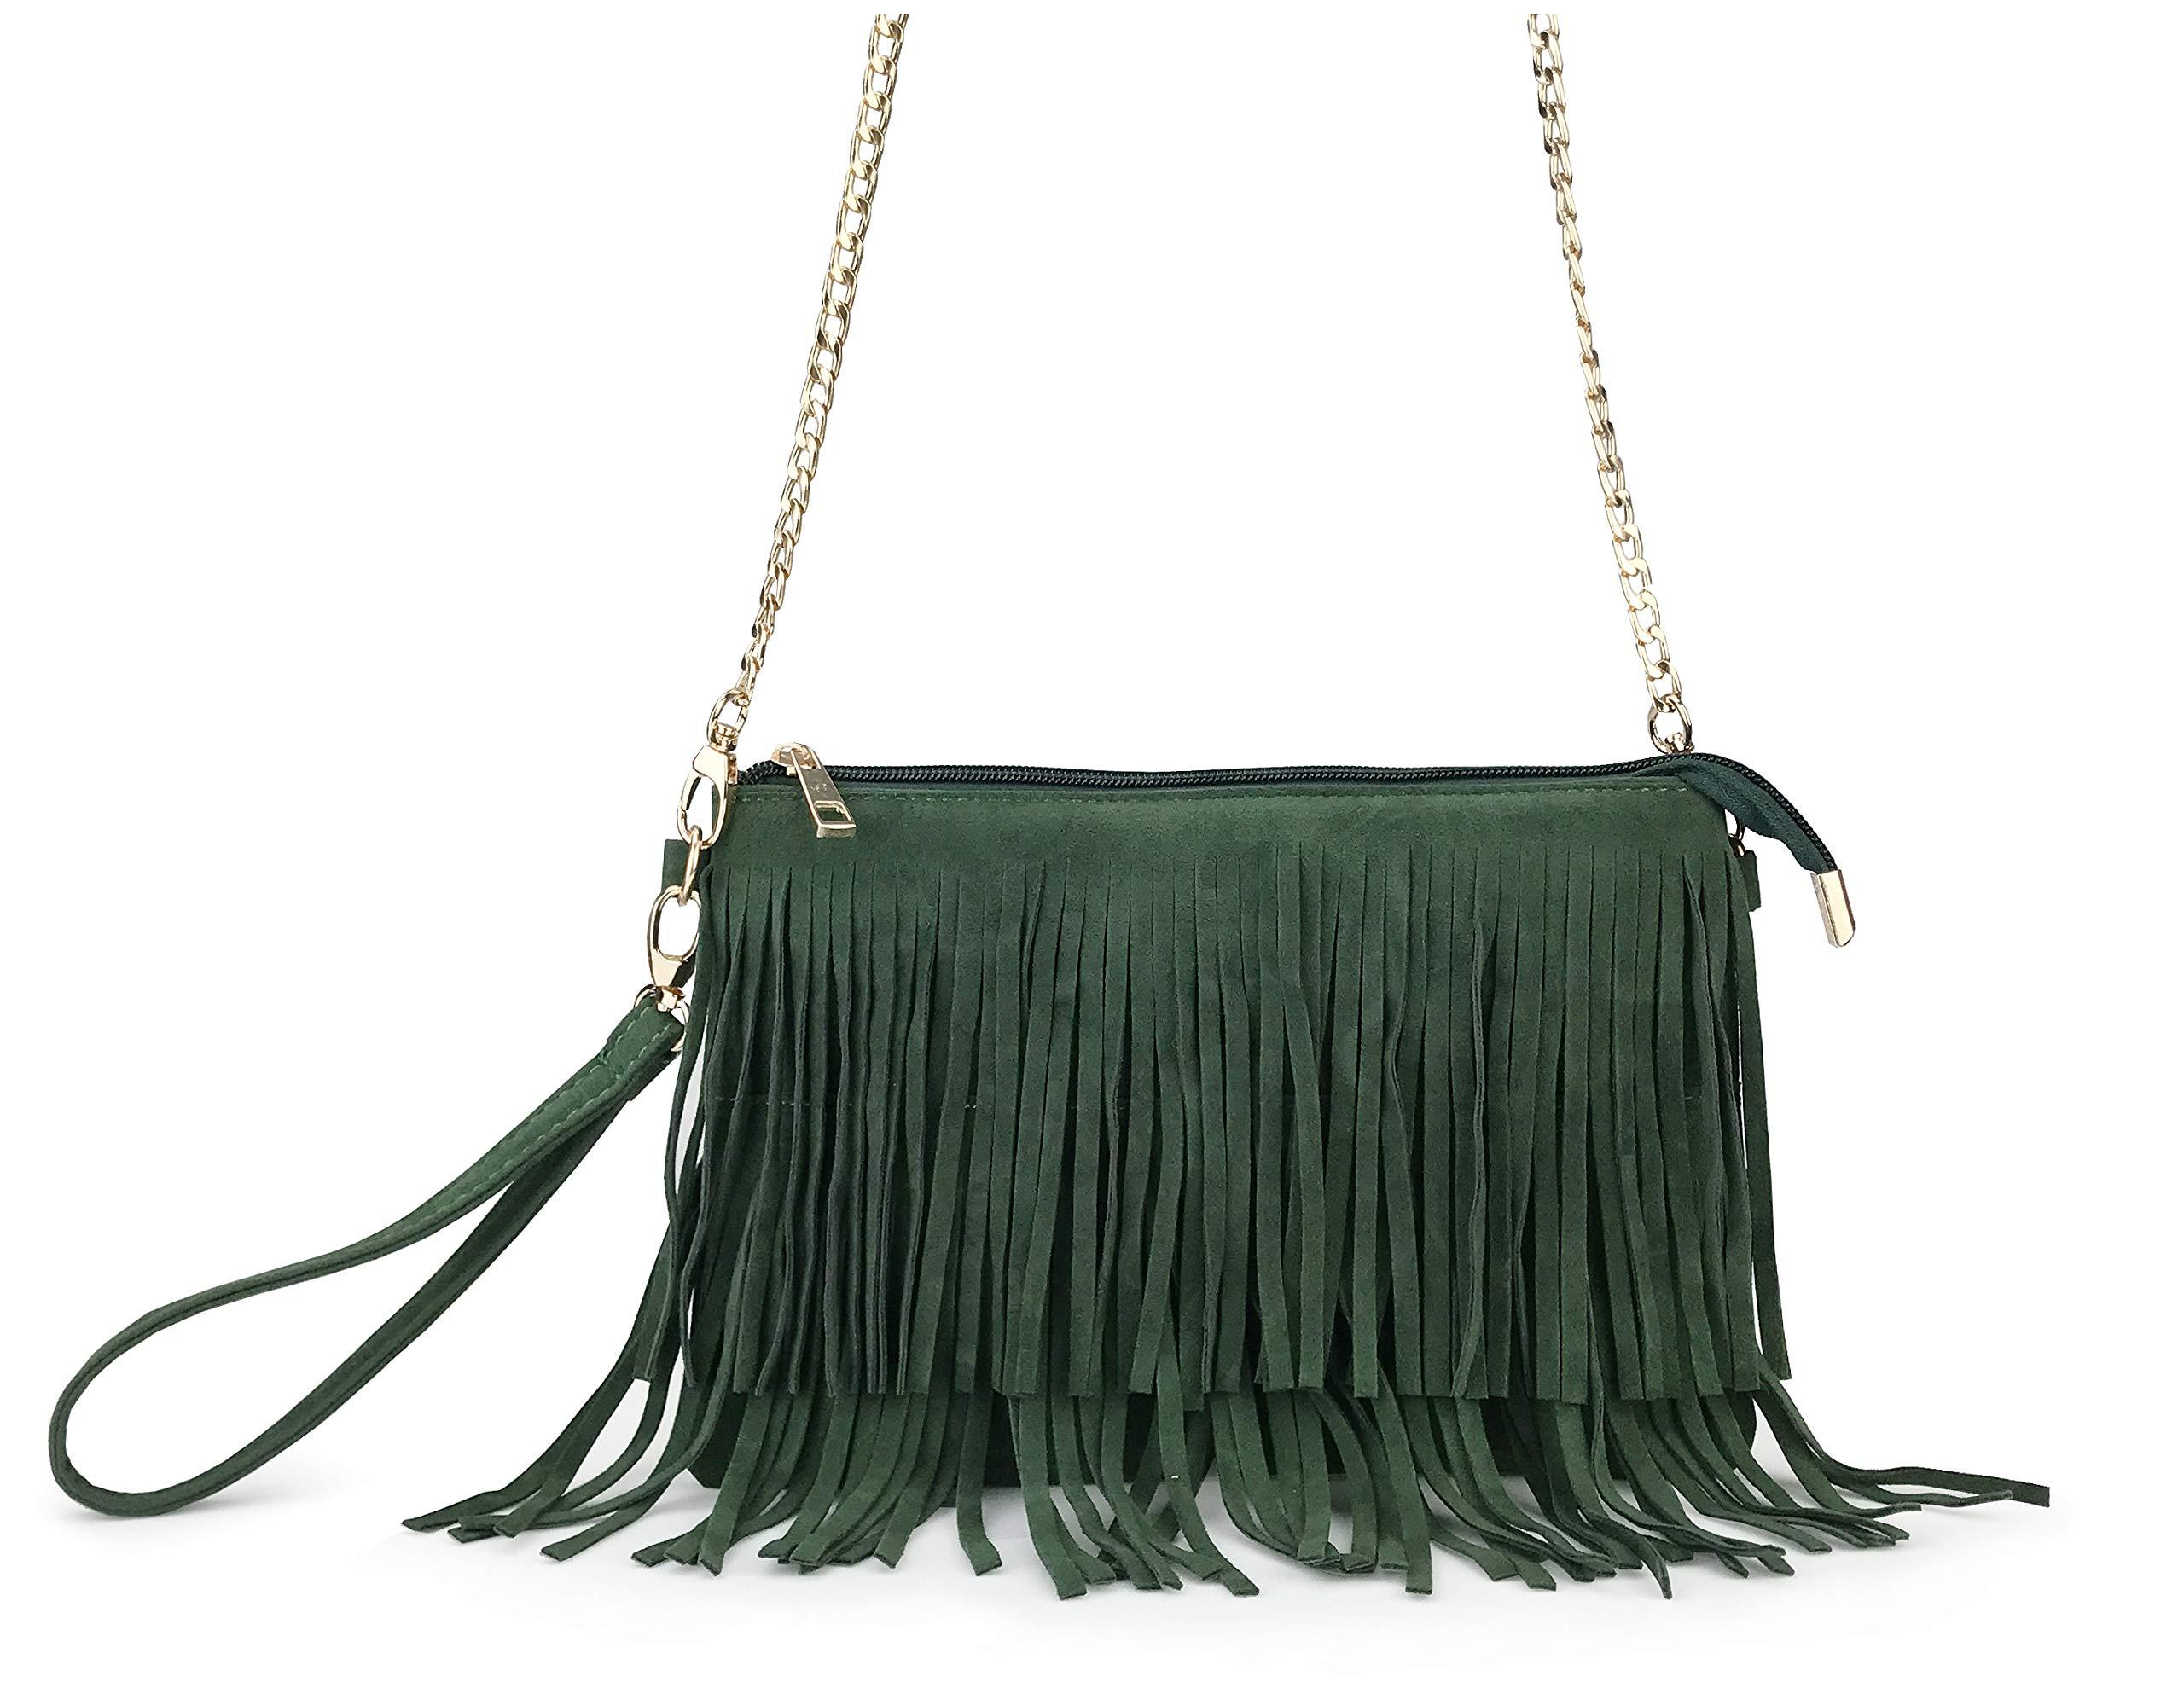 Hoxis Fringe Cross Body Bag Womens Small Shoulder Bag Top Zip Wristlet (Green)